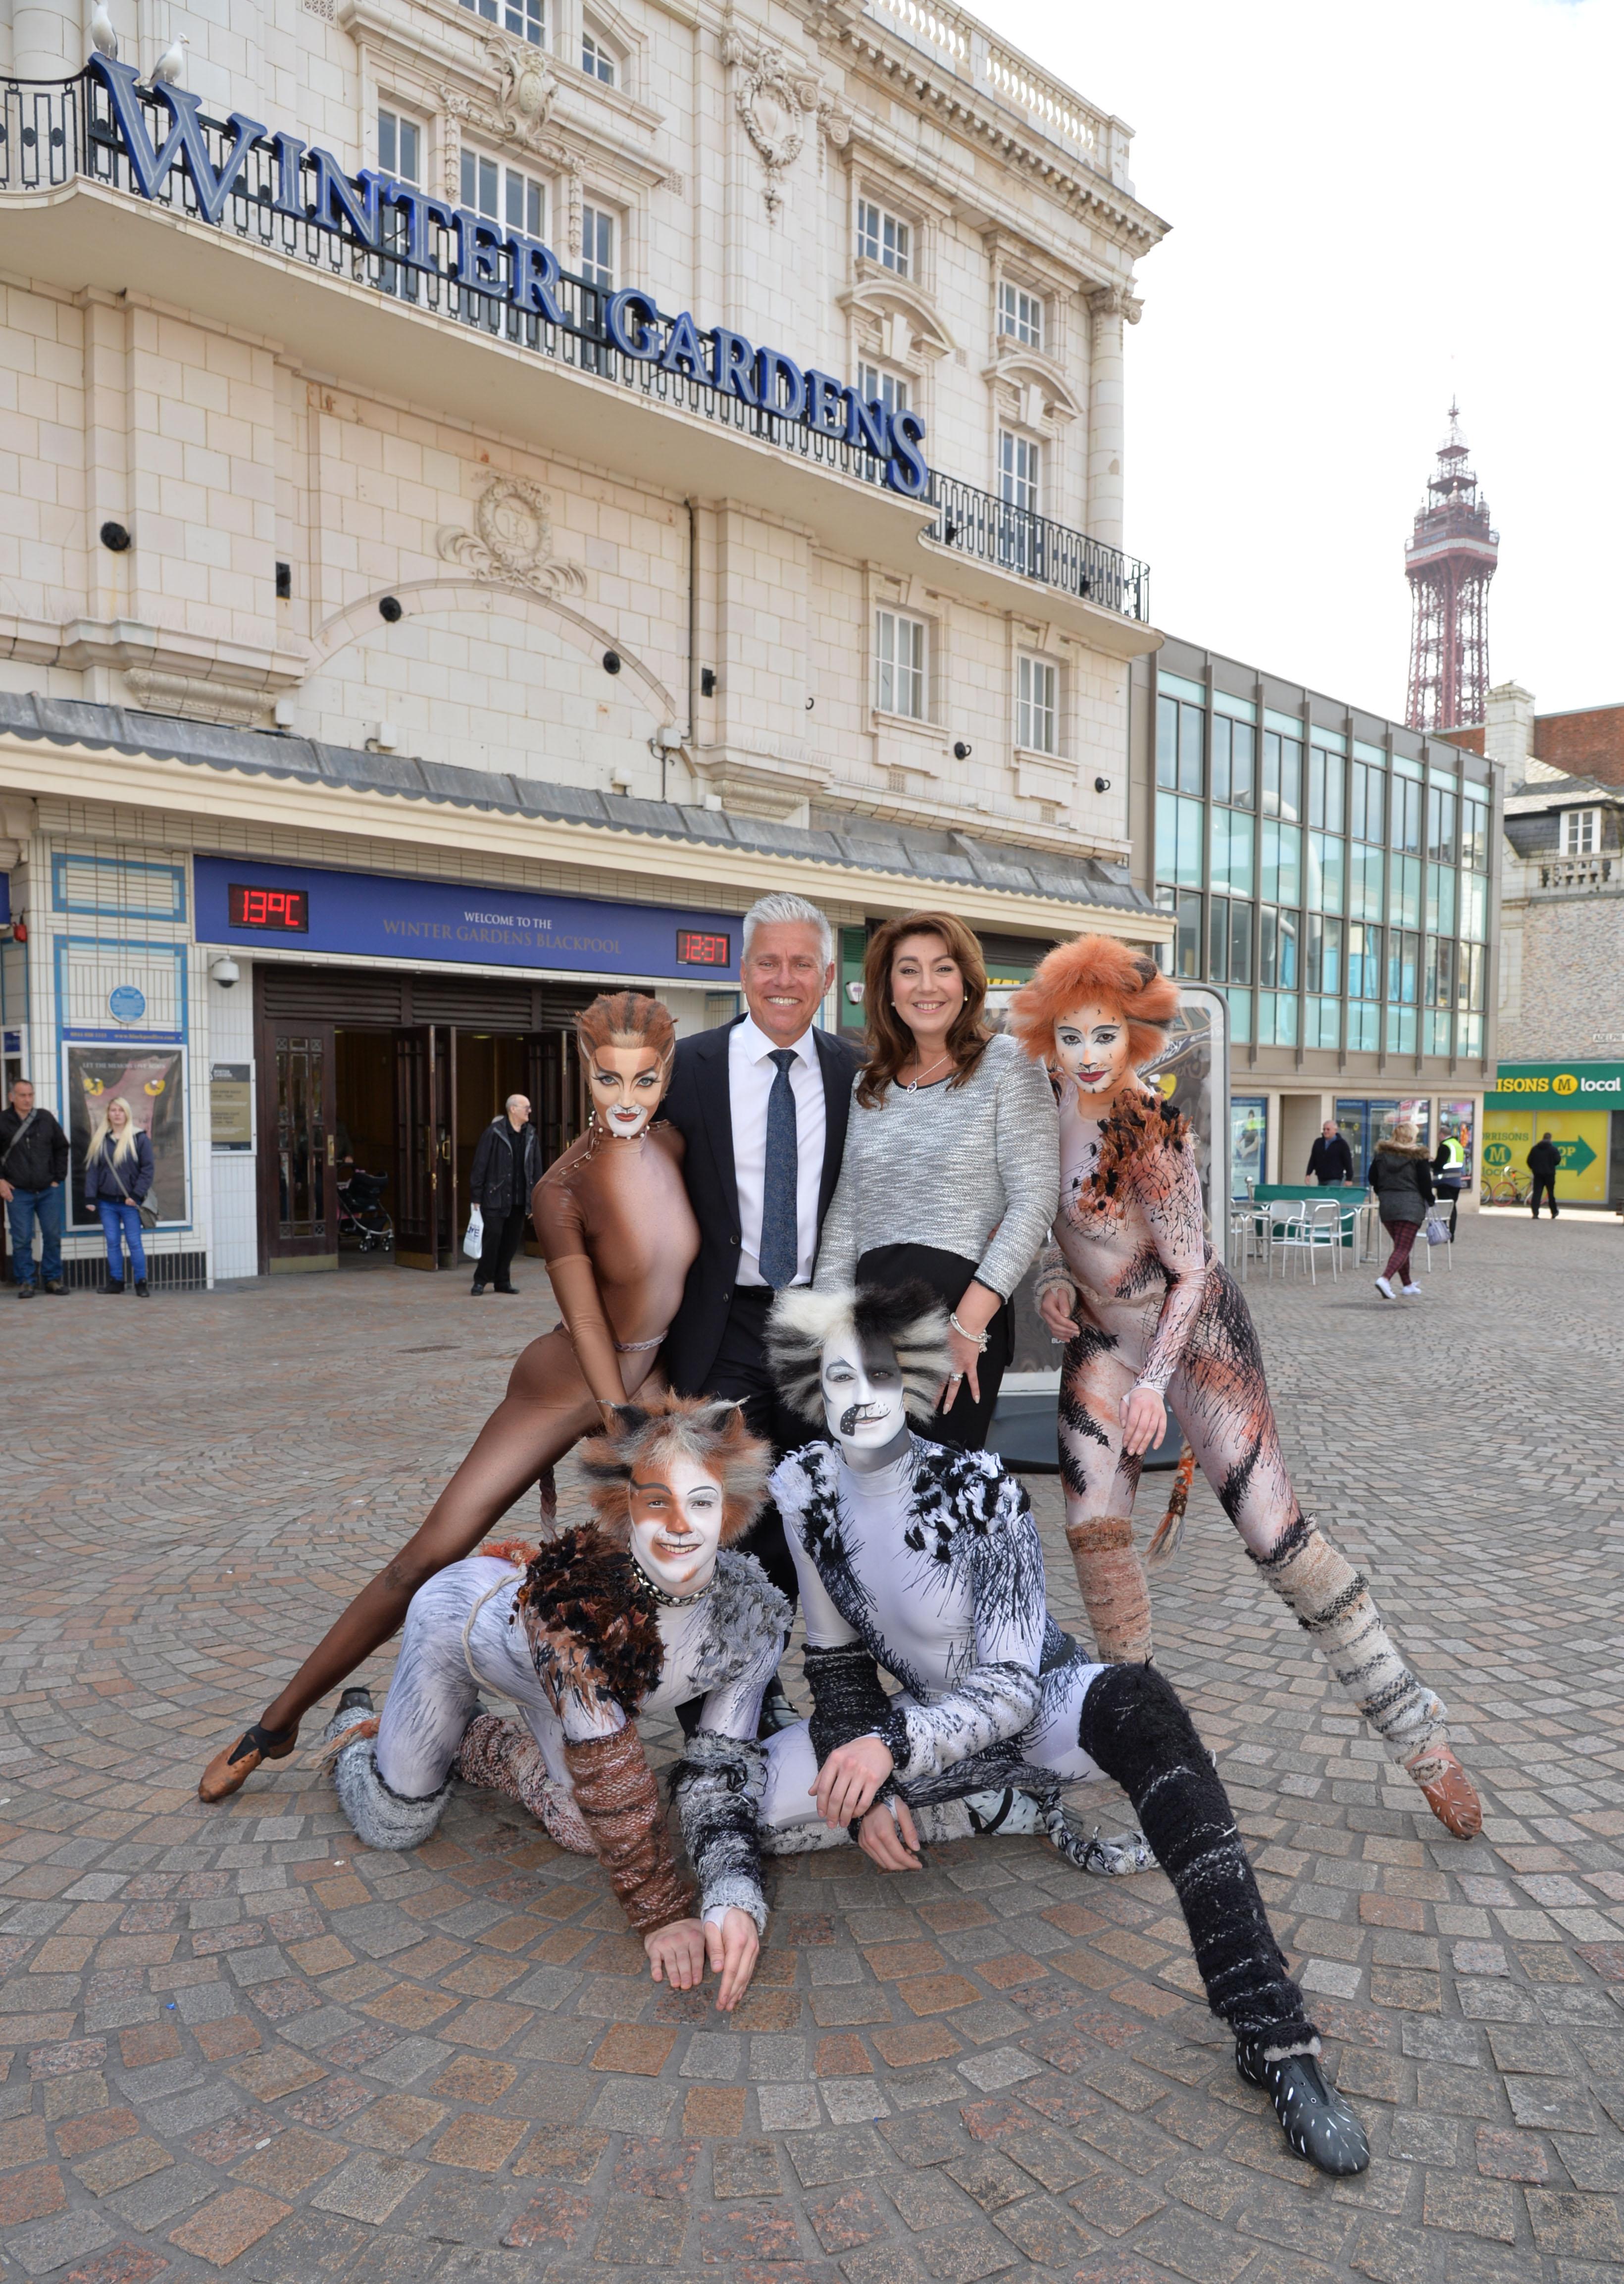 CATS - Jane McDonald and David Ian with Cats outside Blackpool Opera House